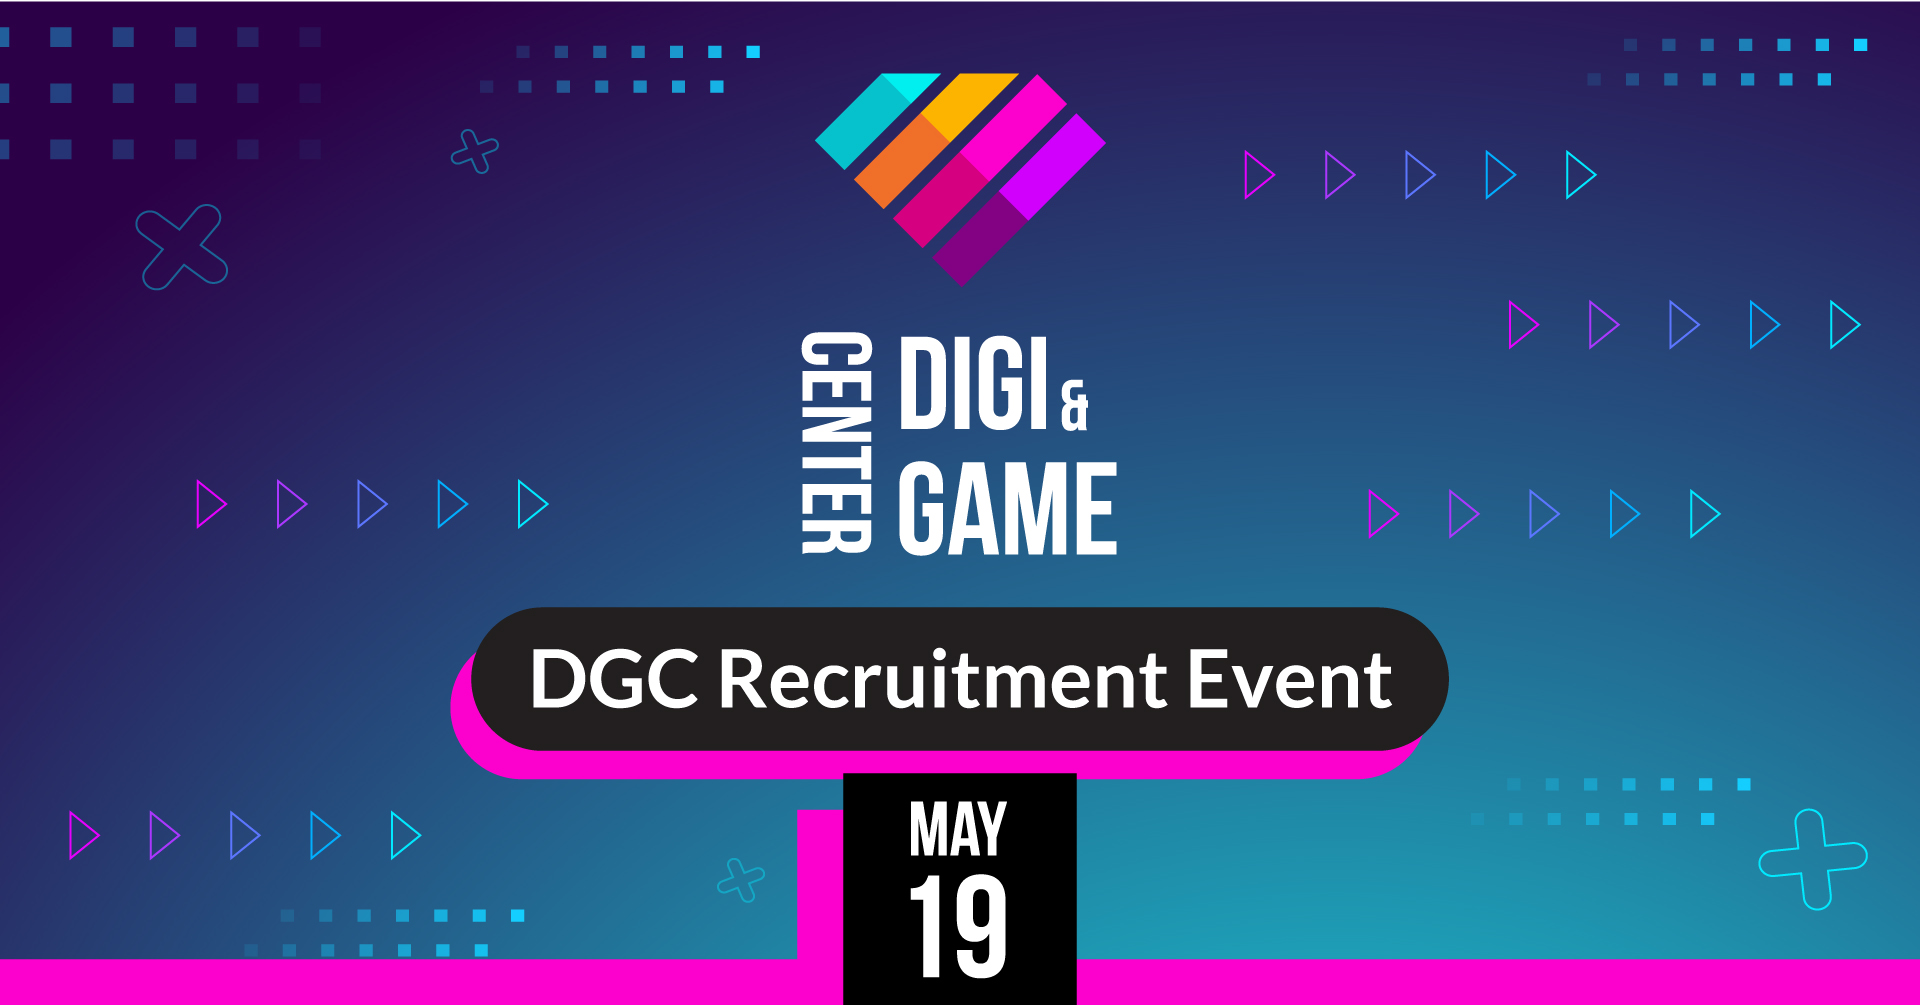 DGC Recruitment Event banner